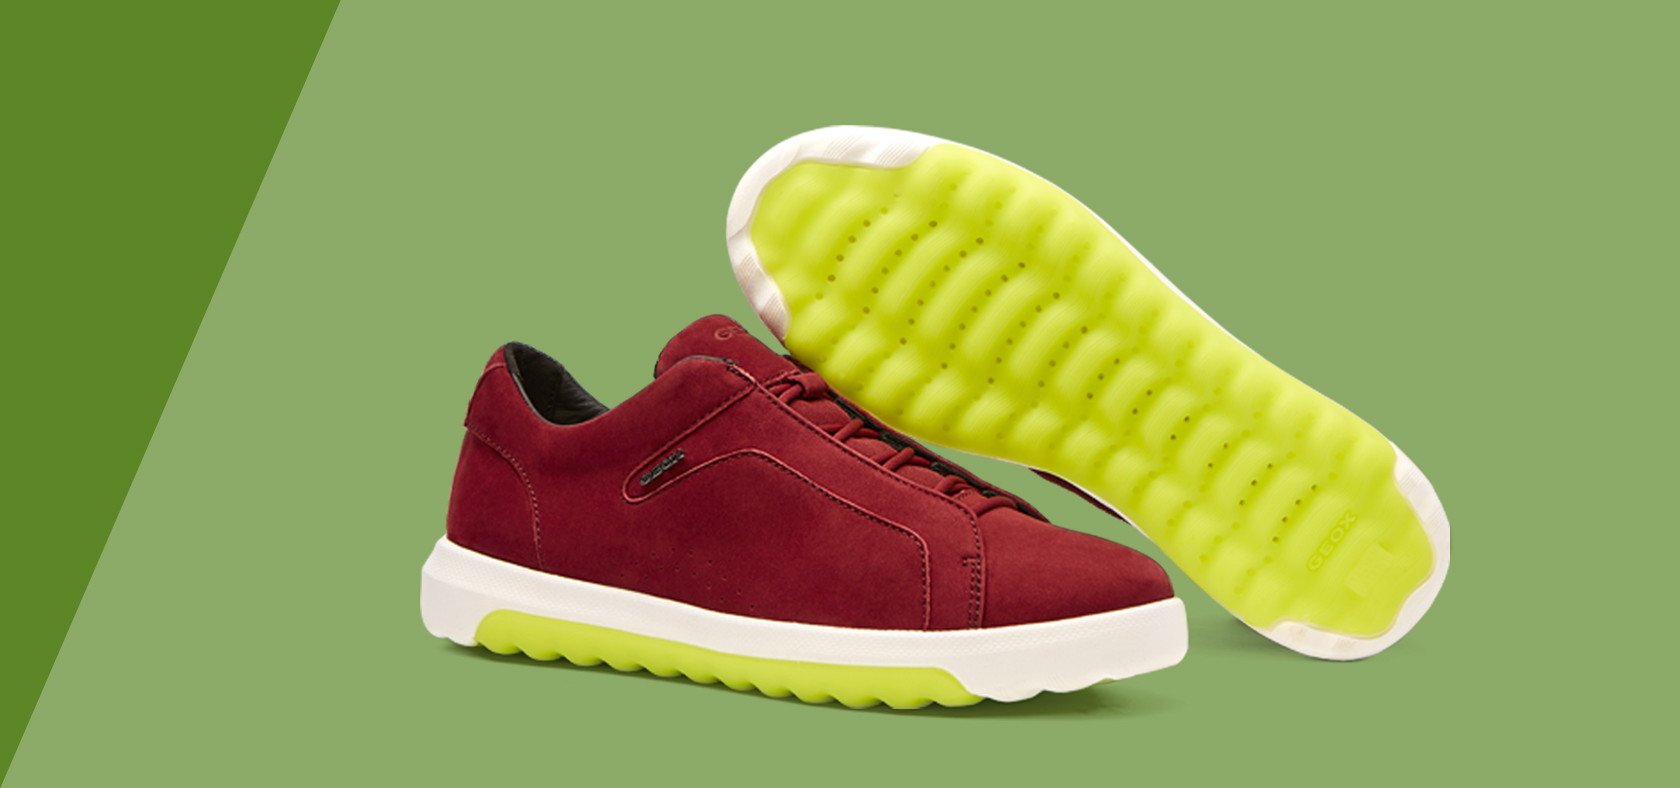 Sneakers Scarpe Nexside DonnaGeox Traspiranti CxWerQdBo